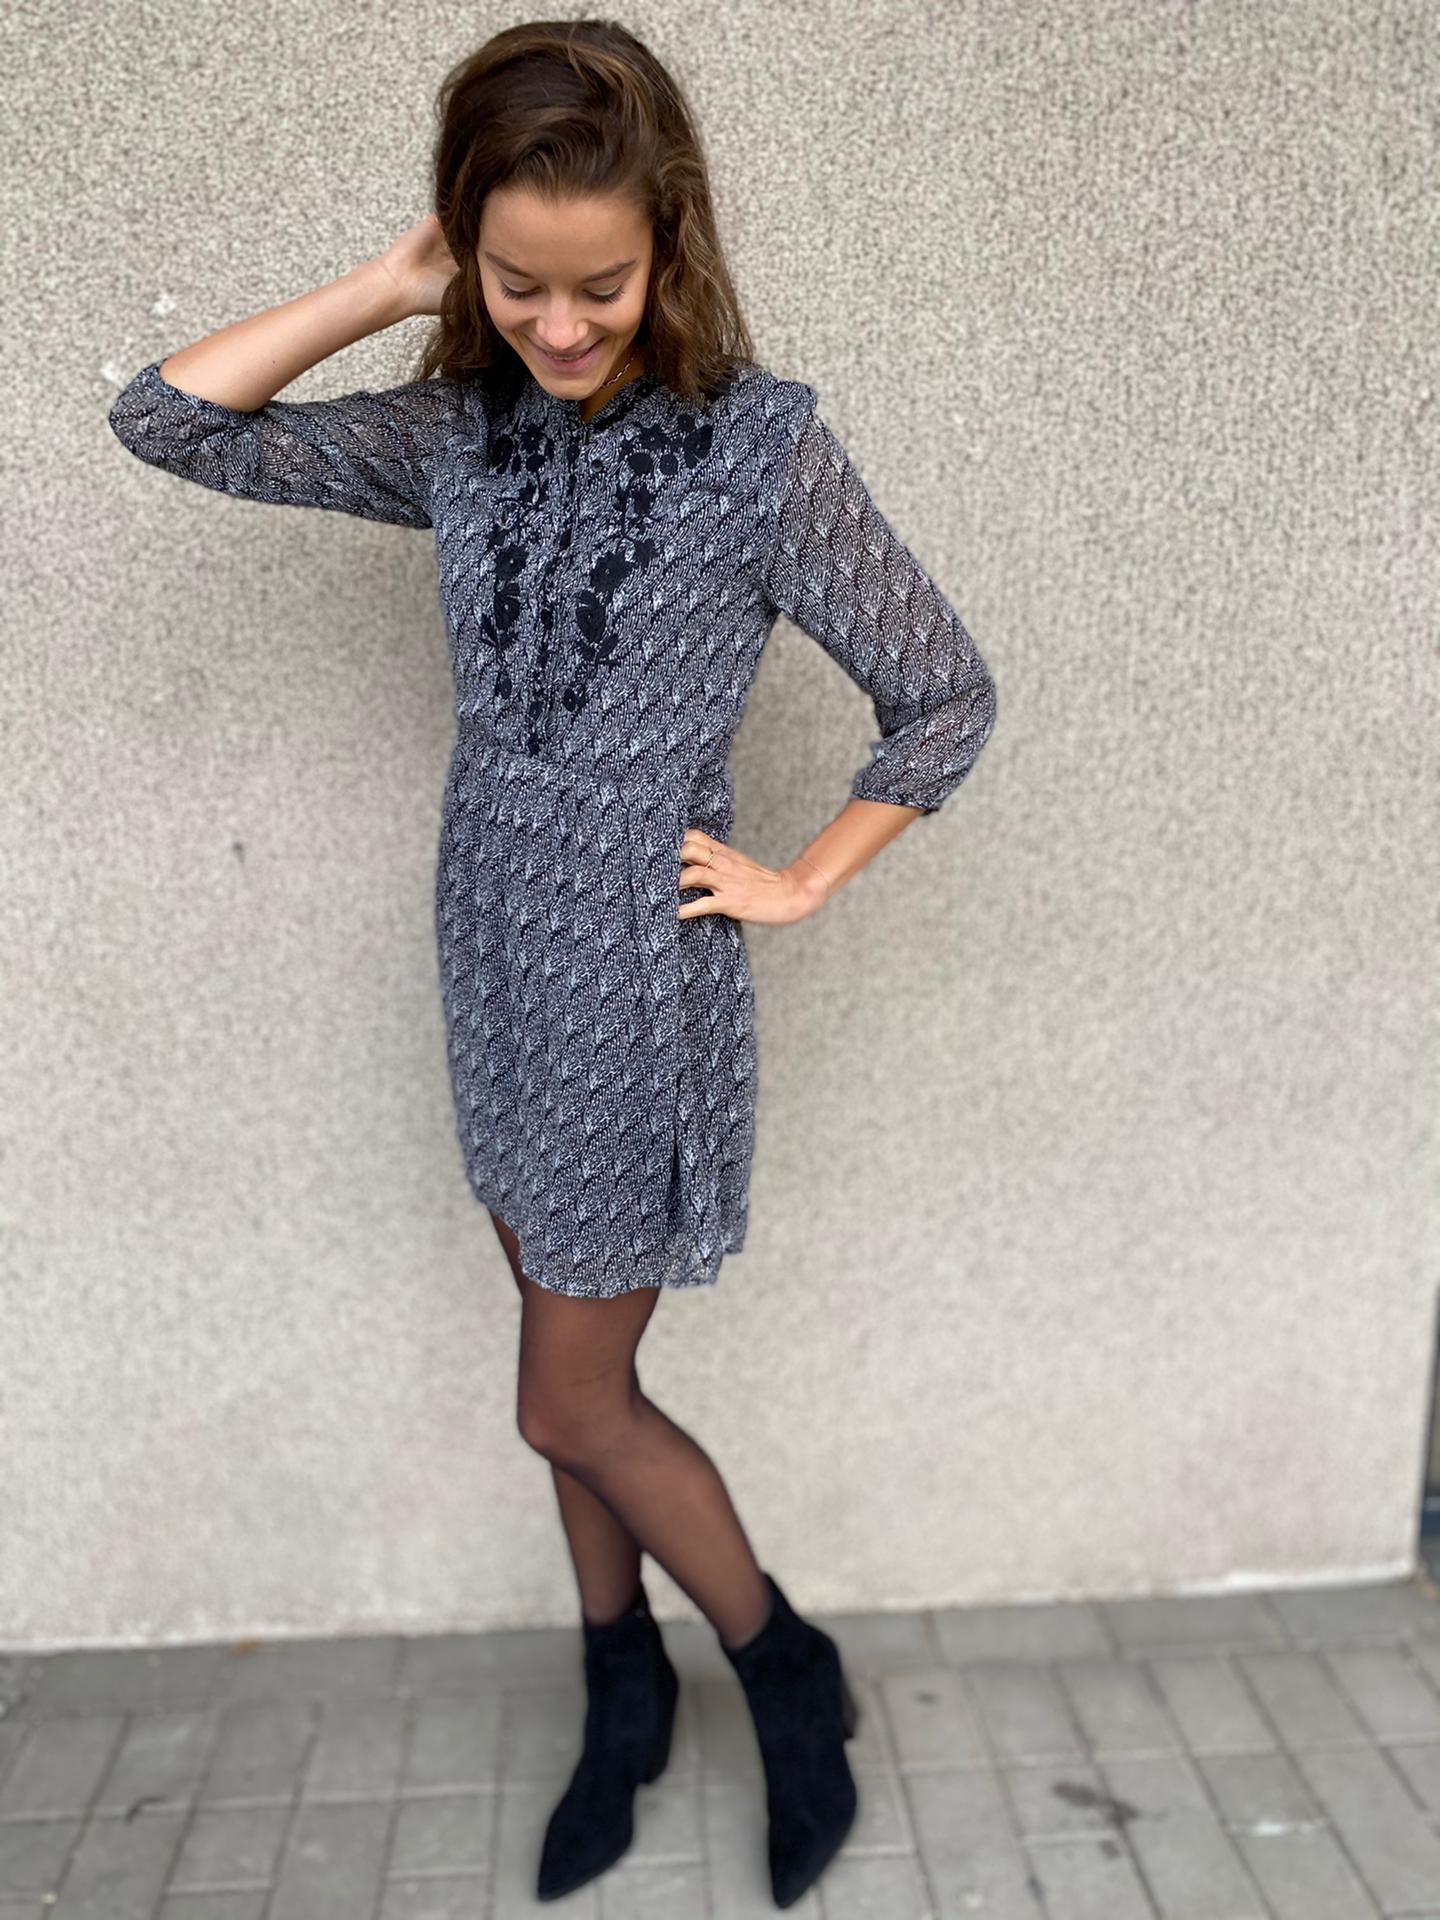 PEPITES robe cindy noir-5